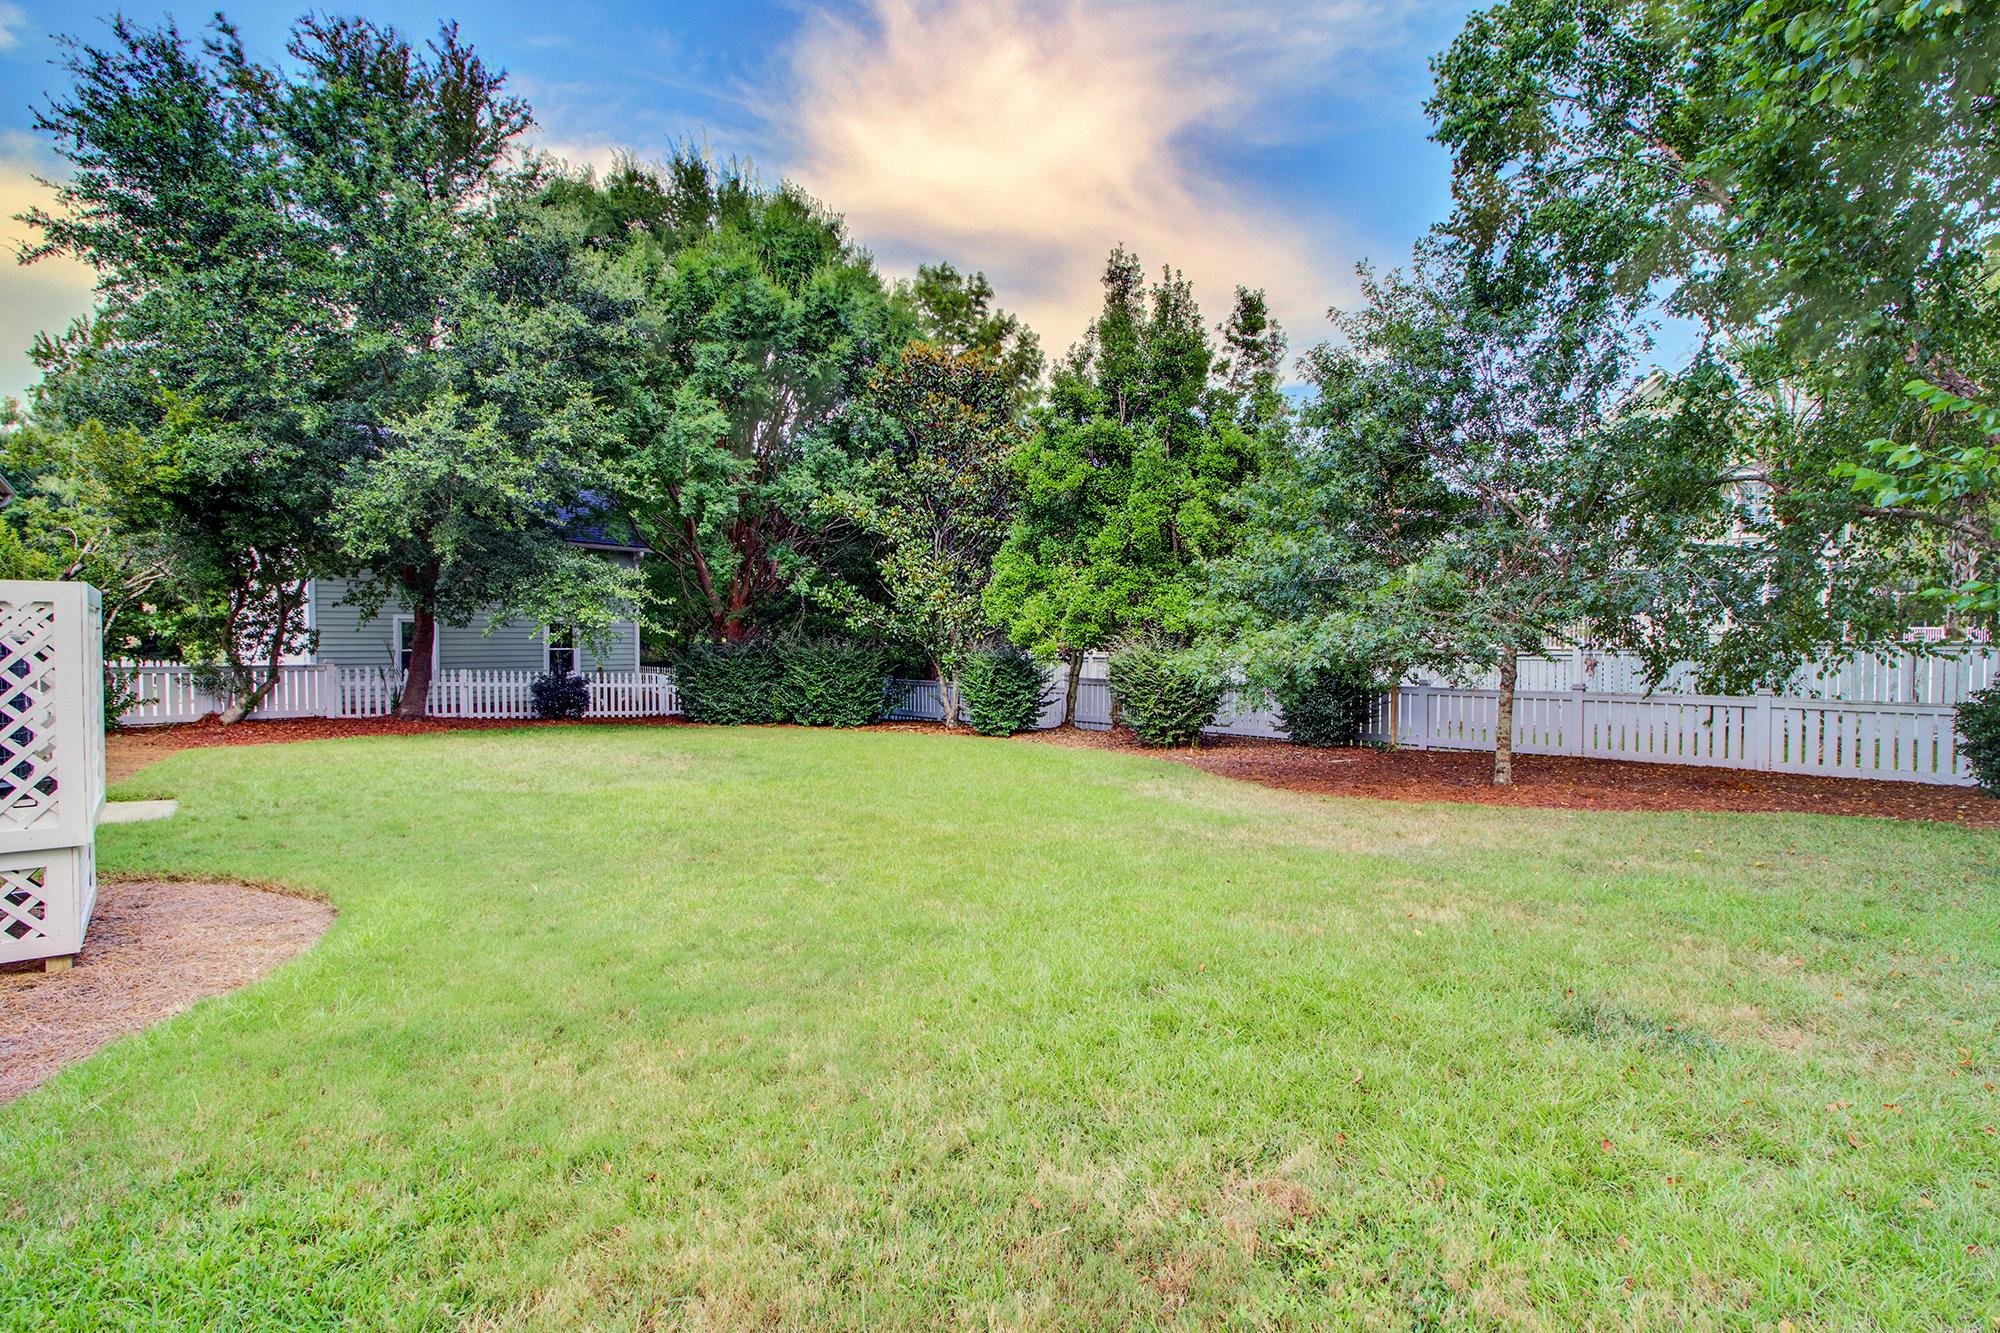 Codners Ferry Park Homes For Sale - 227 Fairchild, Daniel Island, SC - 5